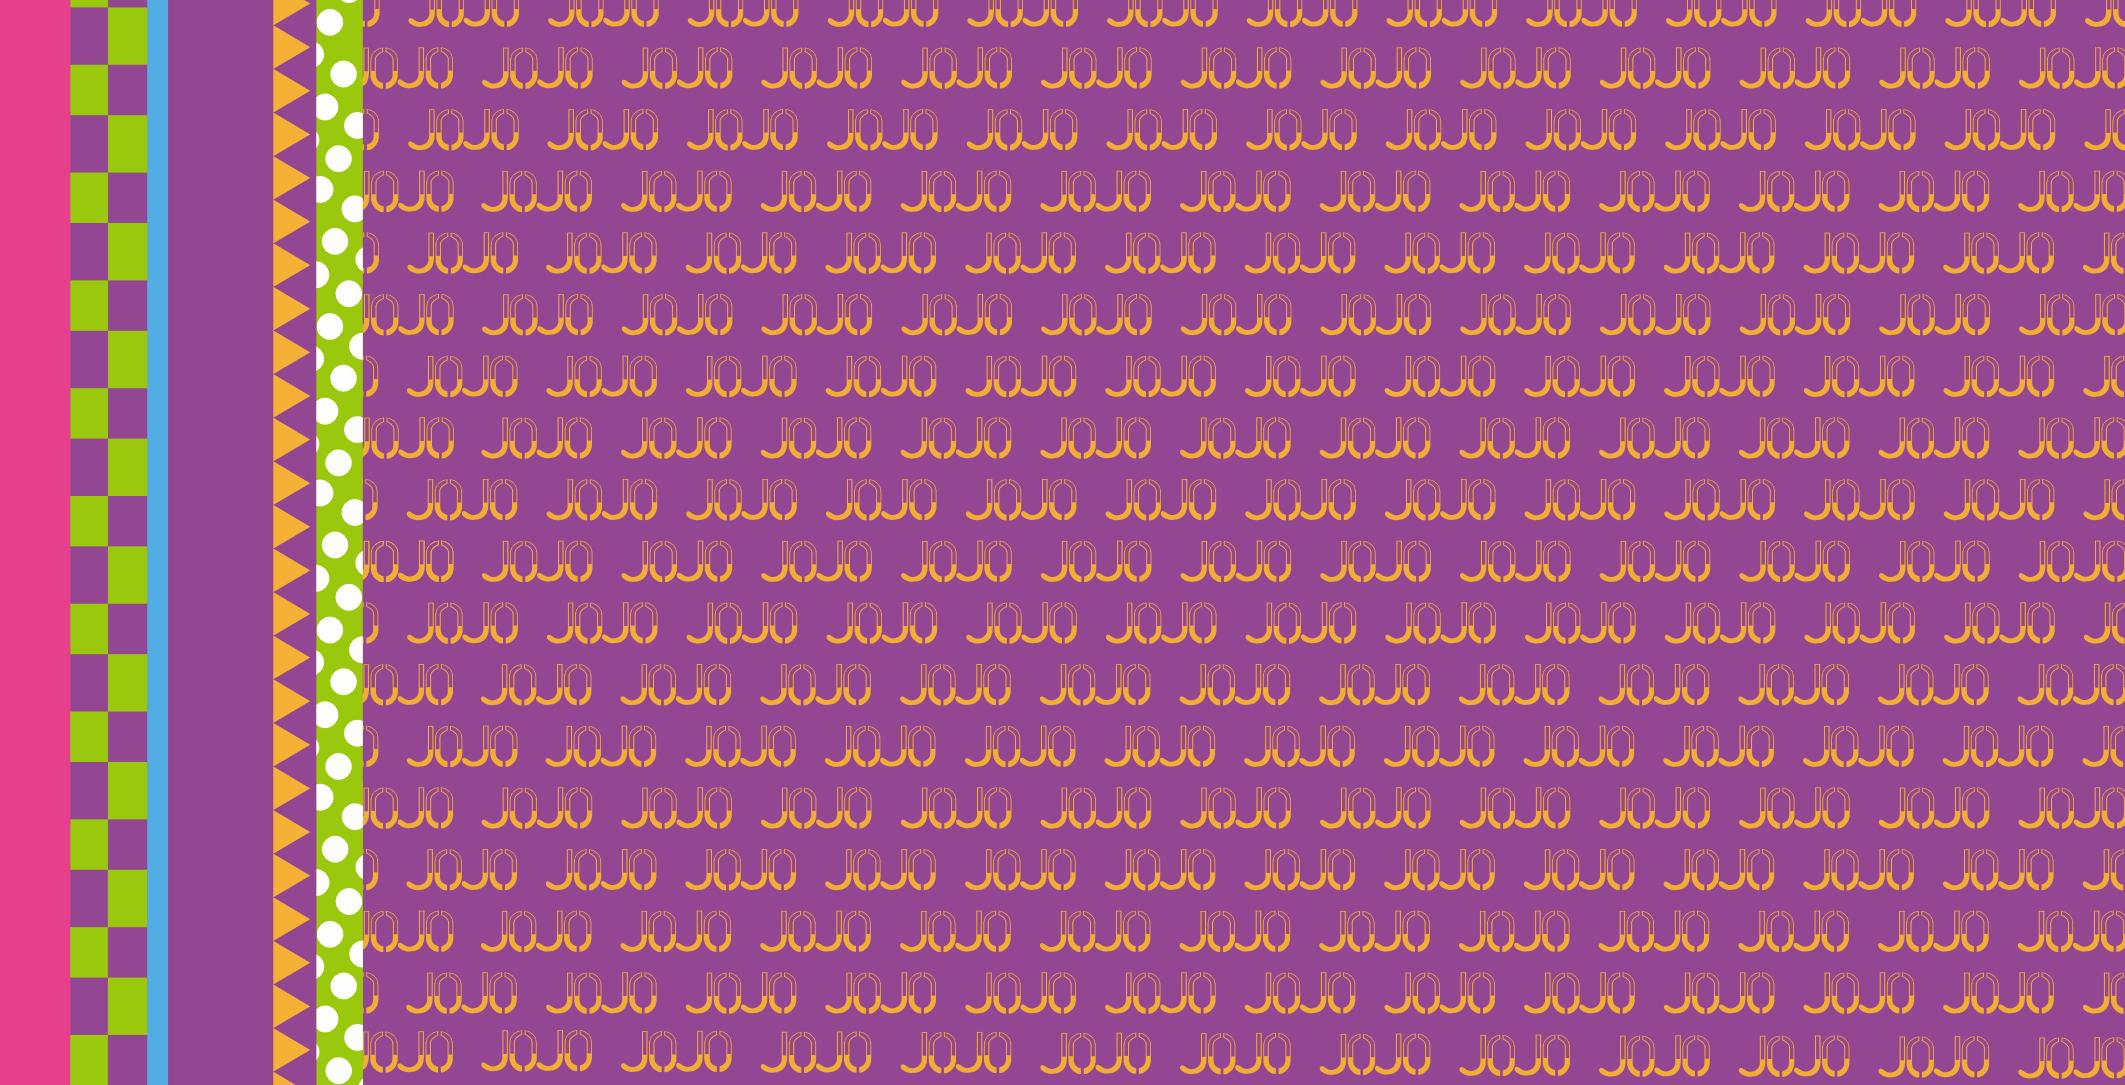 Jojos Bizarre Adventure HD Wallpaper Background Image 2125x1085